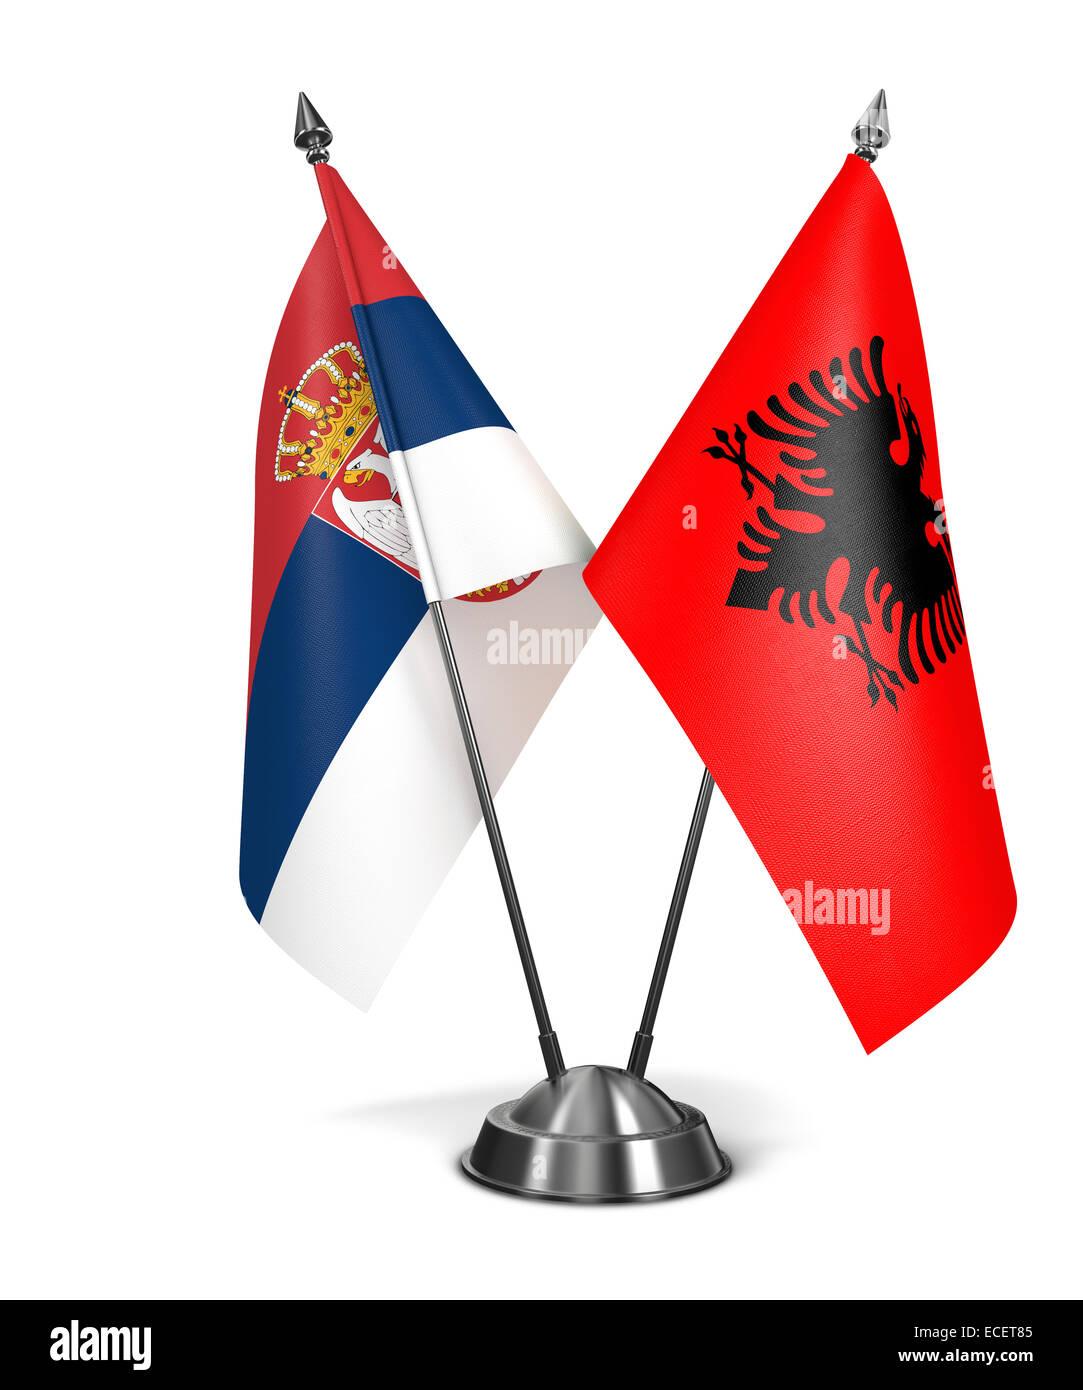 Albania and Serbia - Miniature Flags. - Stock Image